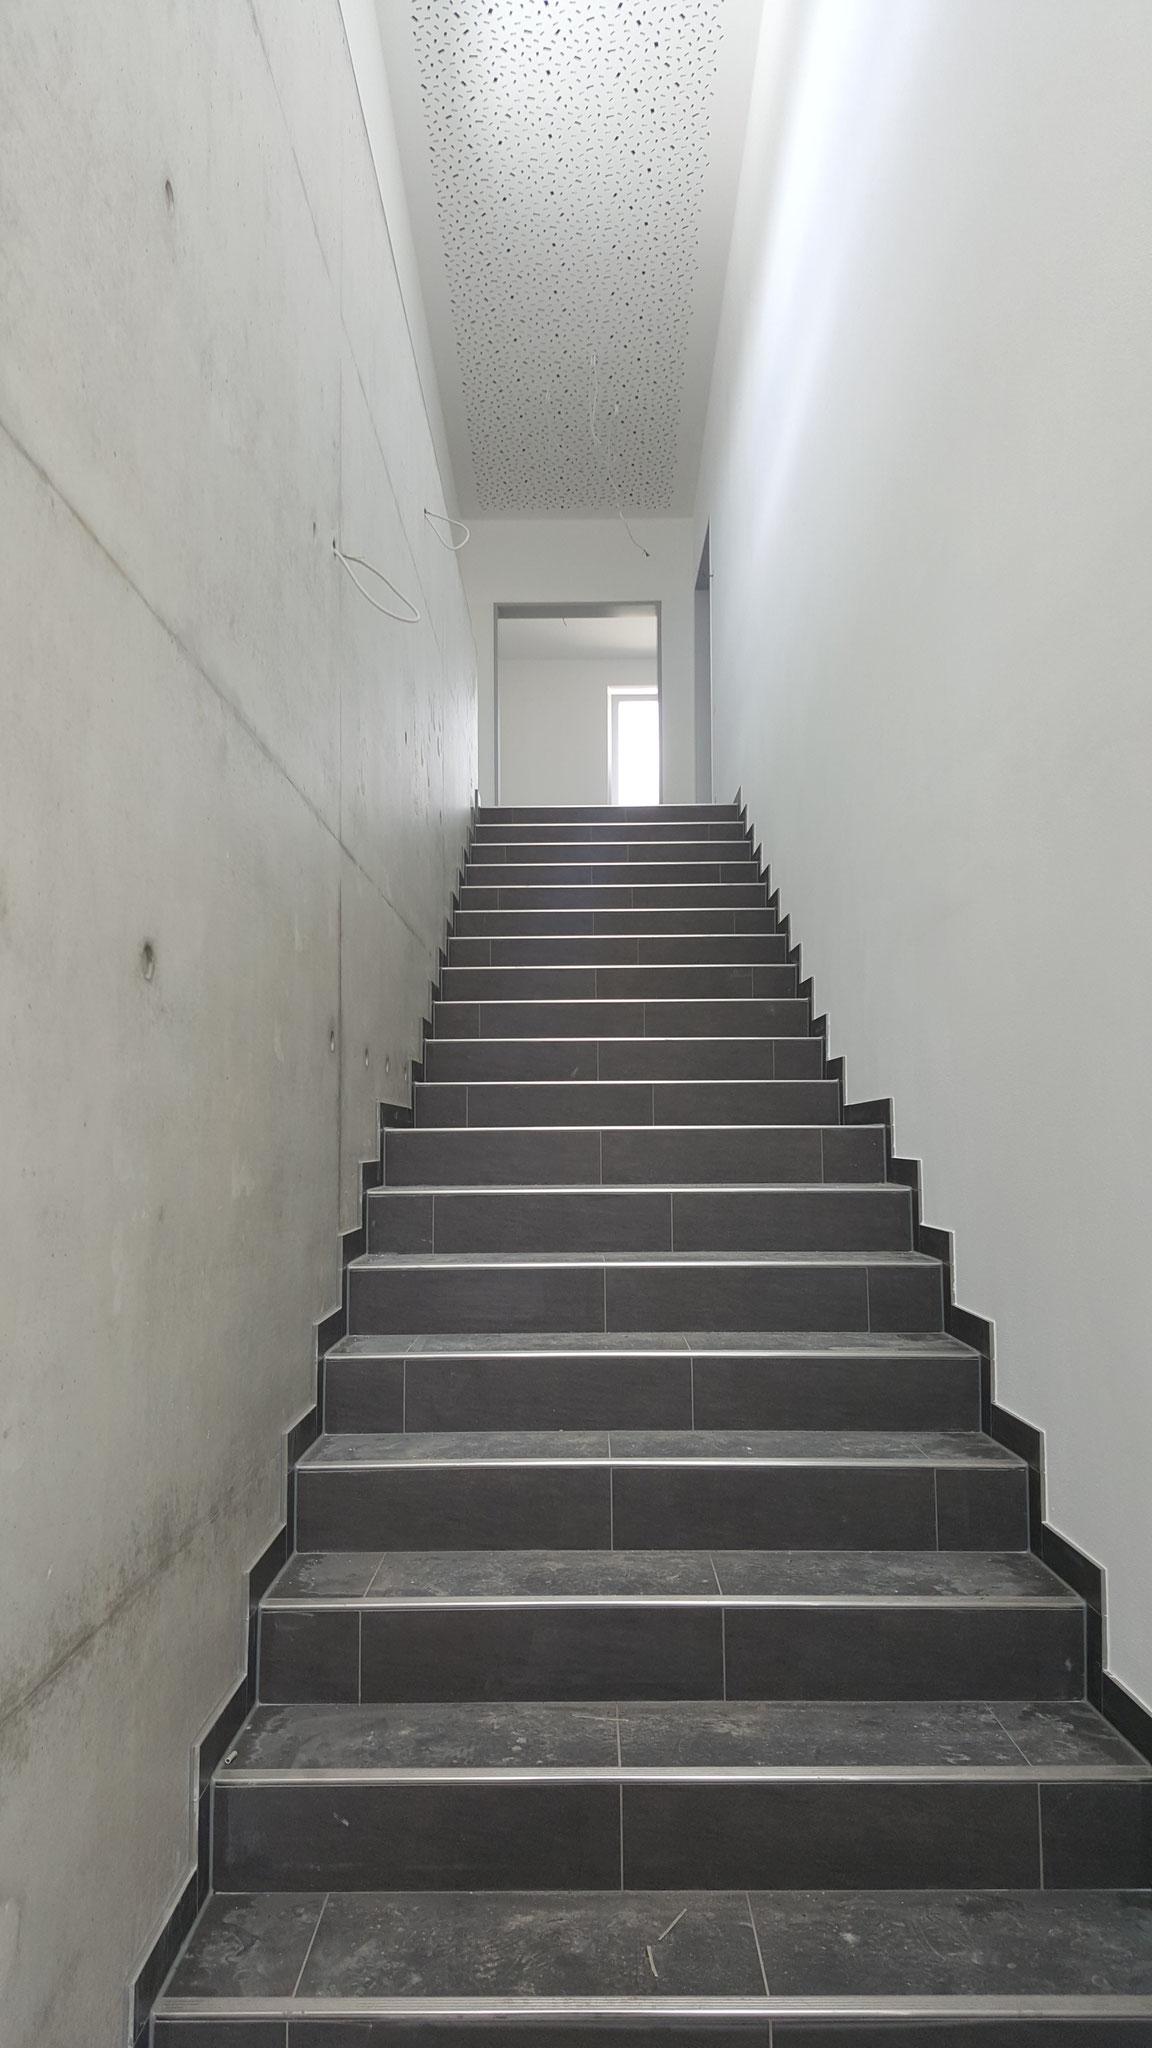 Treppe in 1. Stock